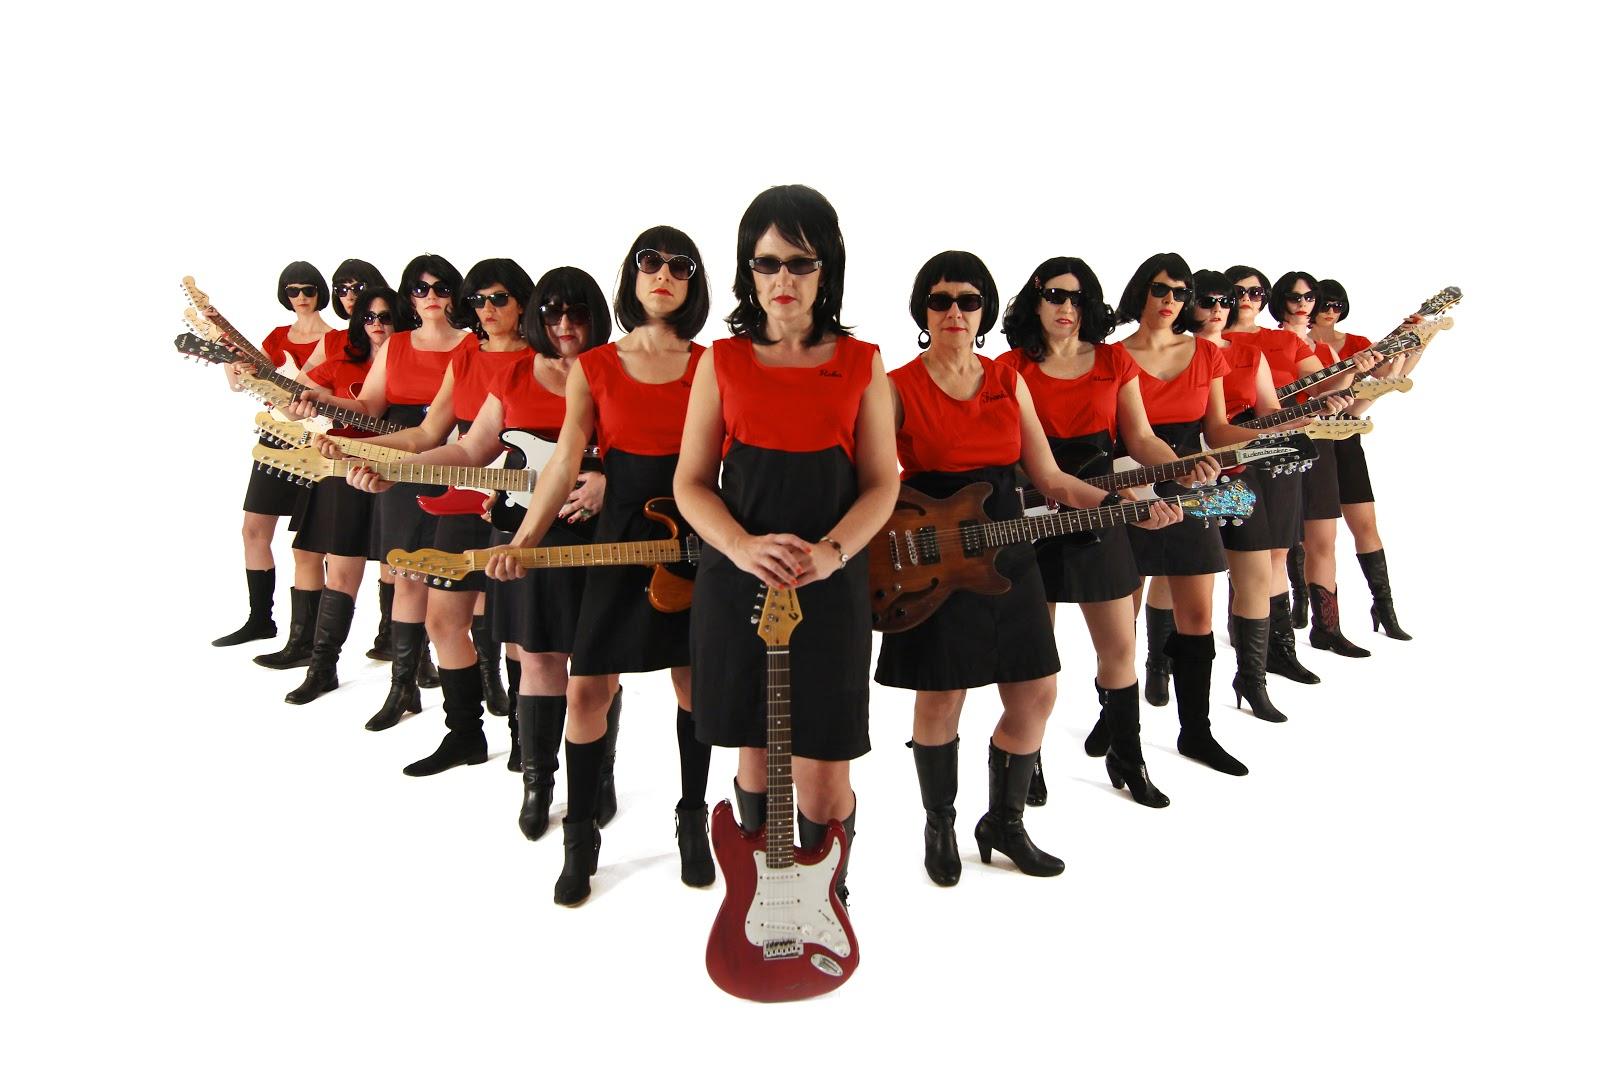 Yuh huh. 15 electric guitars.